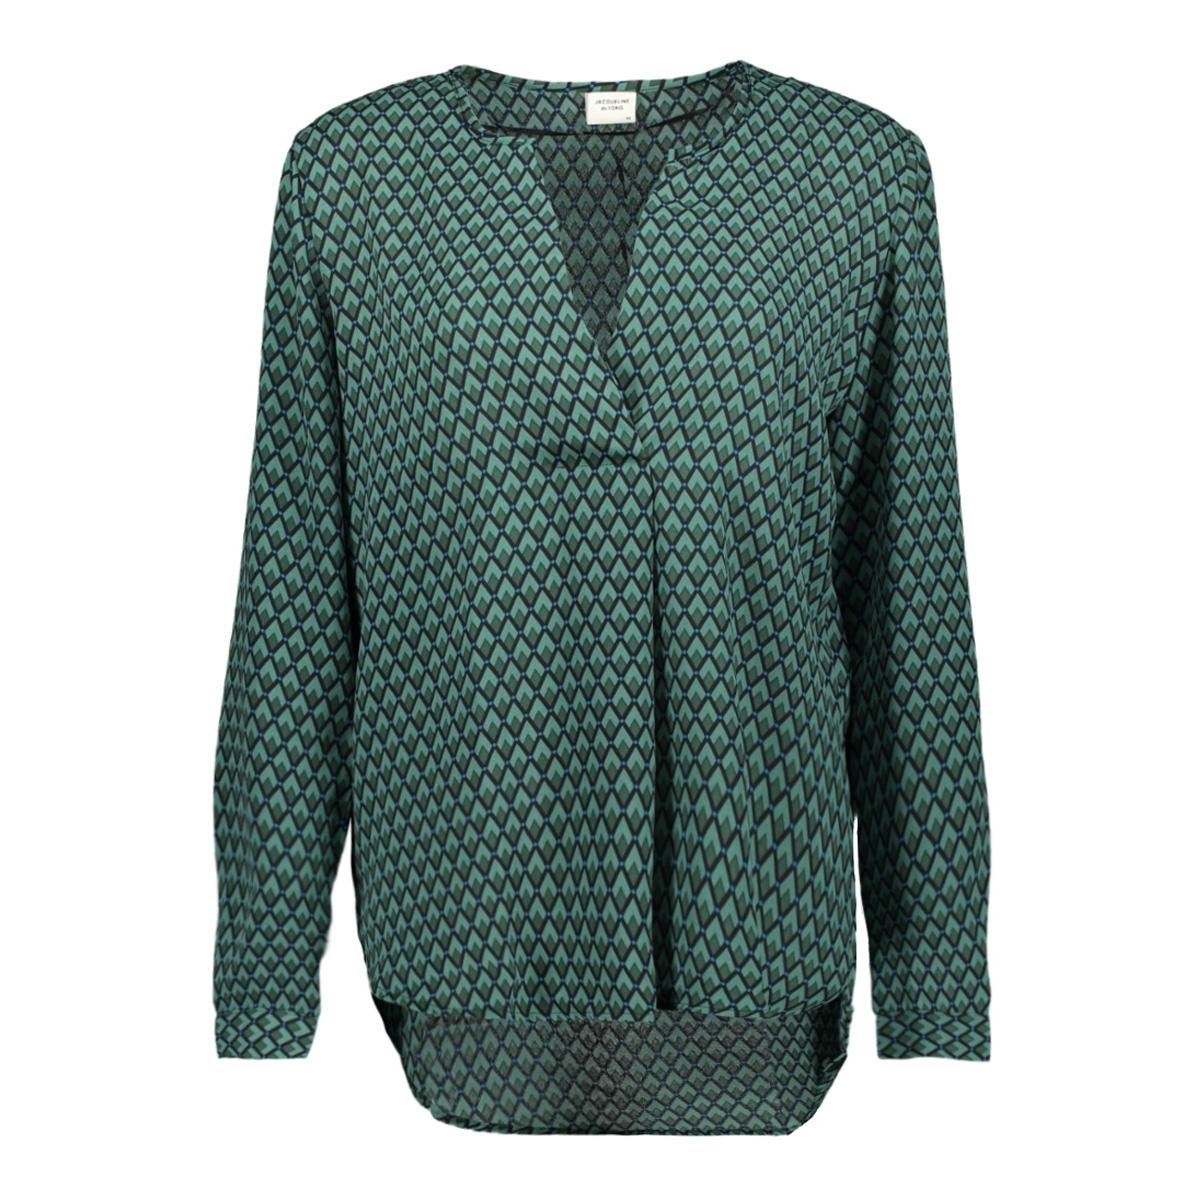 jdyzoey treats l/s v-neck blouse wv 15181124 jacqueline de yong blouse bottle green/green grap